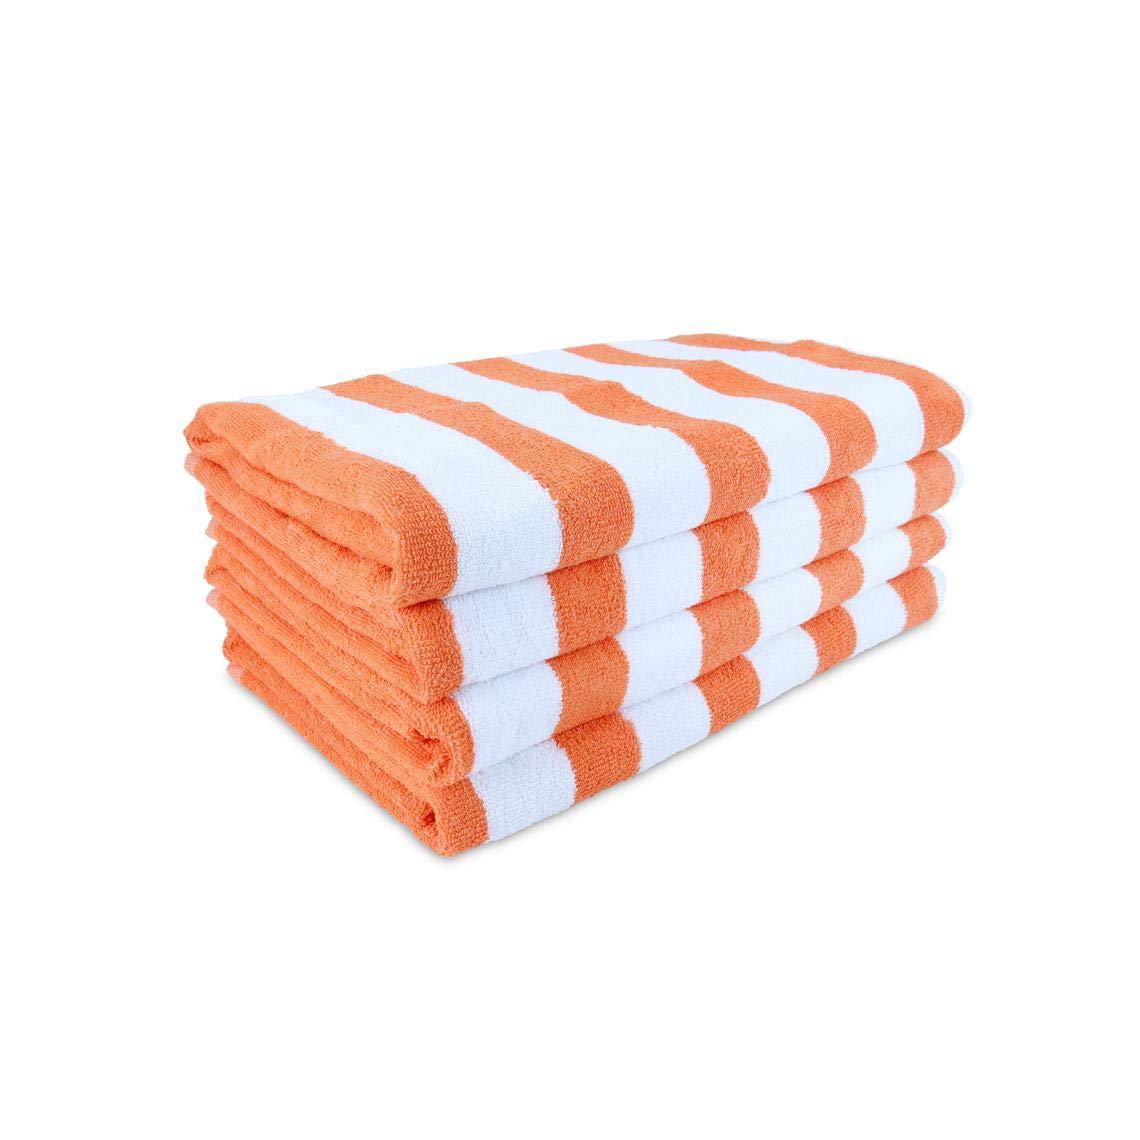 Simpli-Magic 79041 Pool Towels Chicago Mall - Pack Grade Discount mail order 36 B